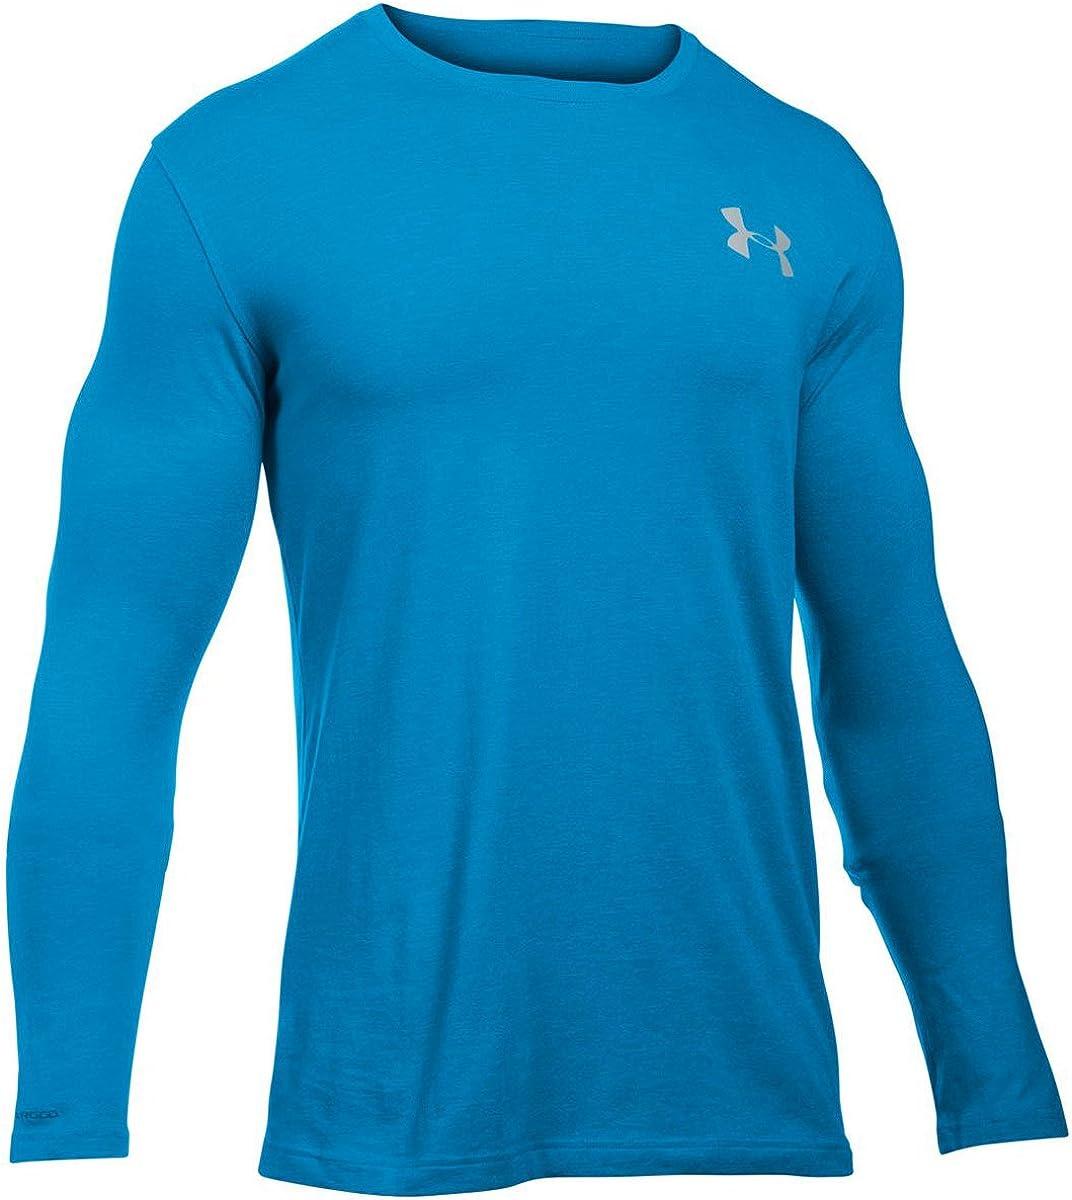 Under Armour Men/'s Midnight Navy UA Threadborne Seamless Long Sleeve T-Shirt